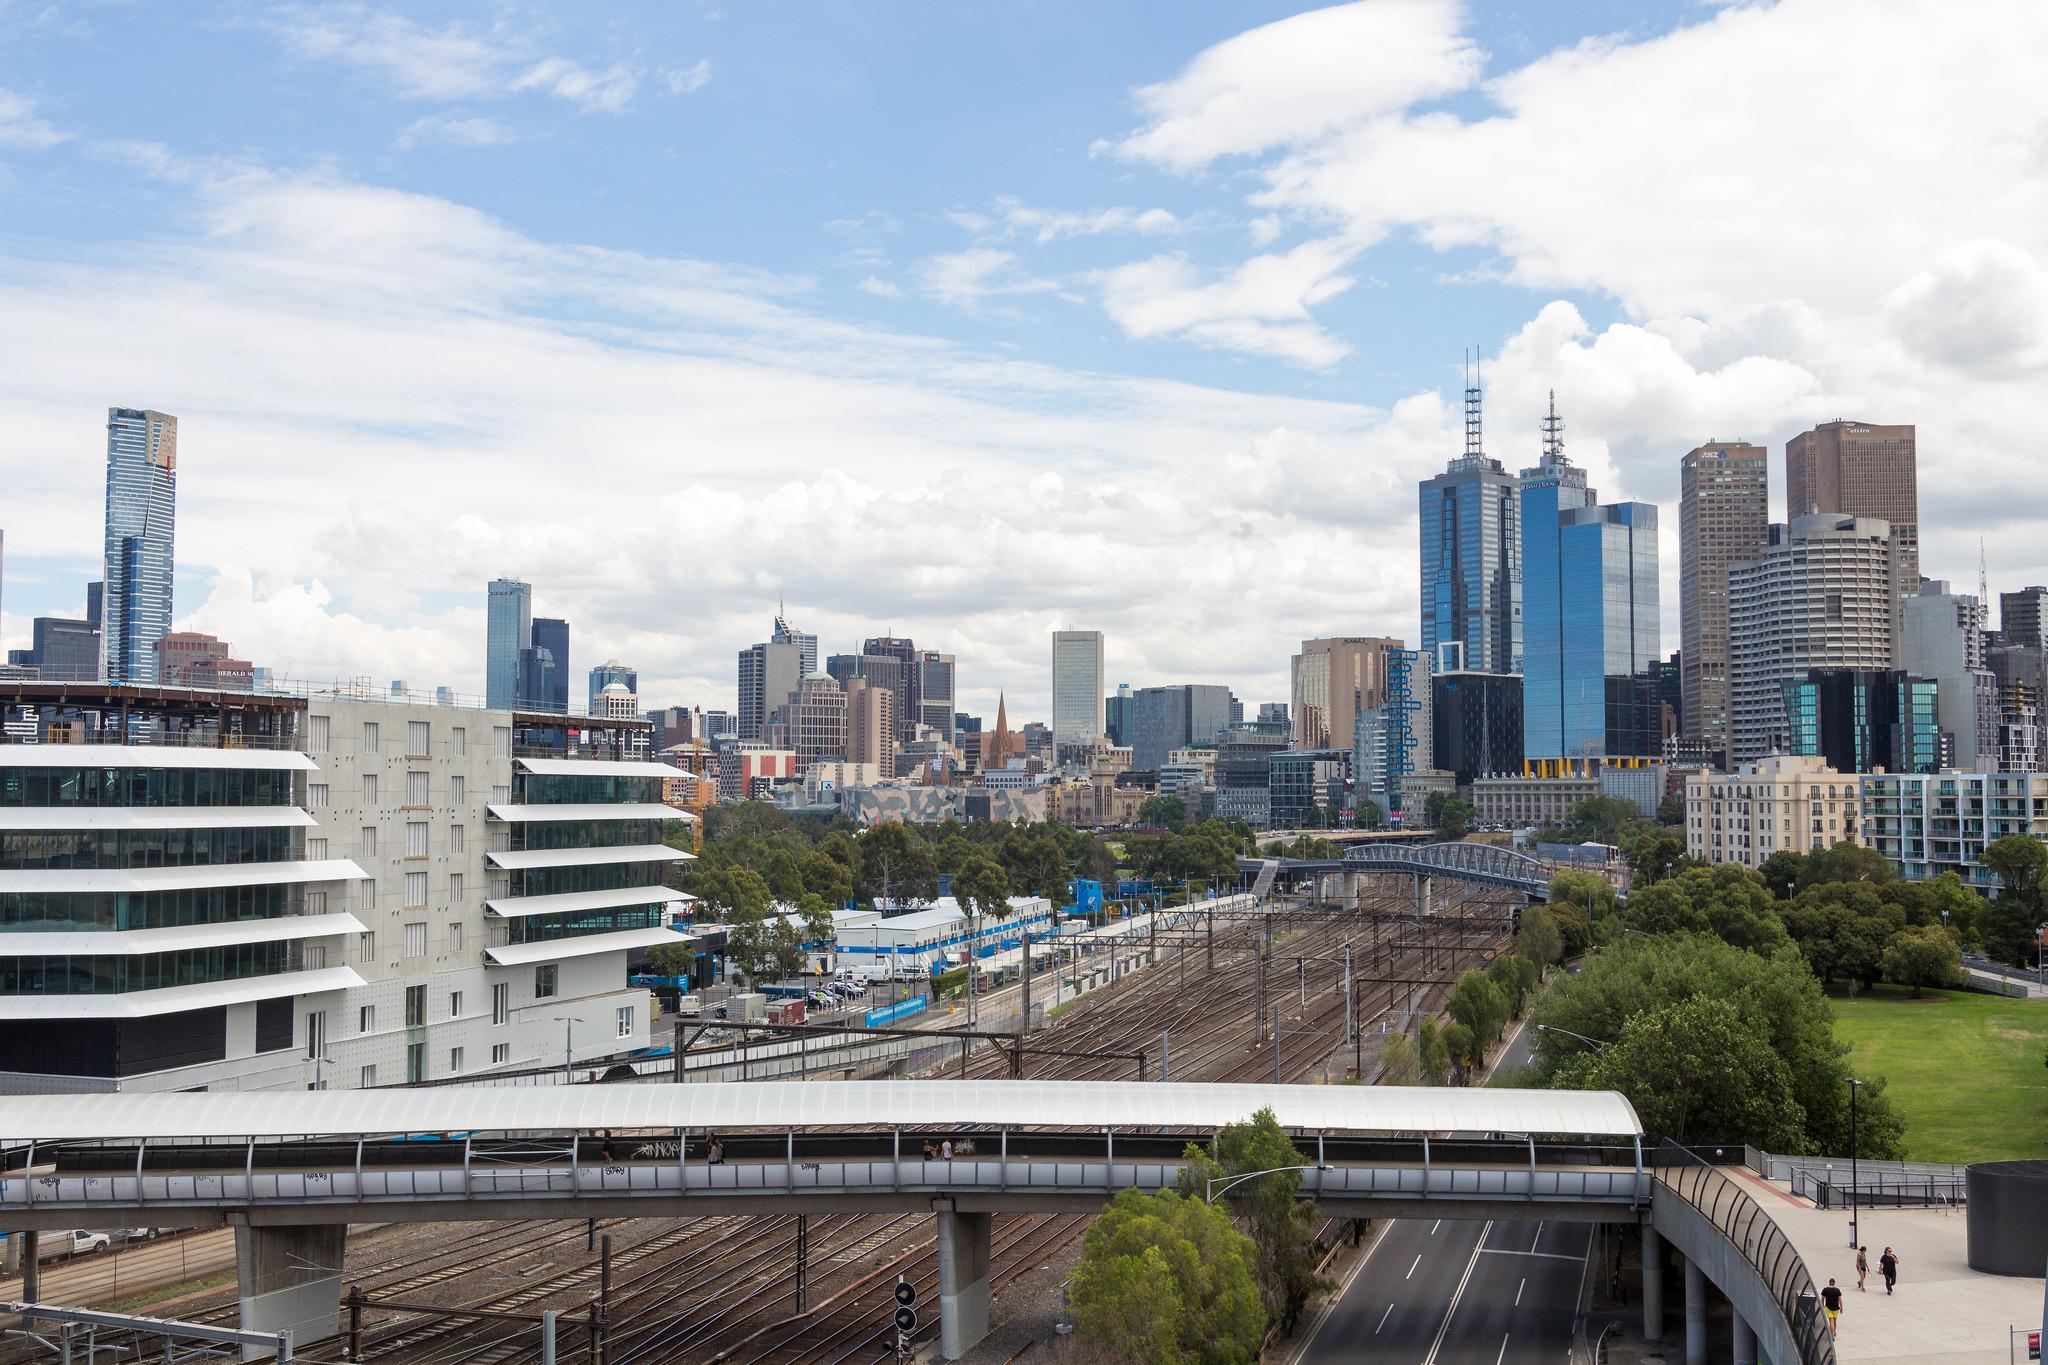 Melbourne City from the MCG, Australia